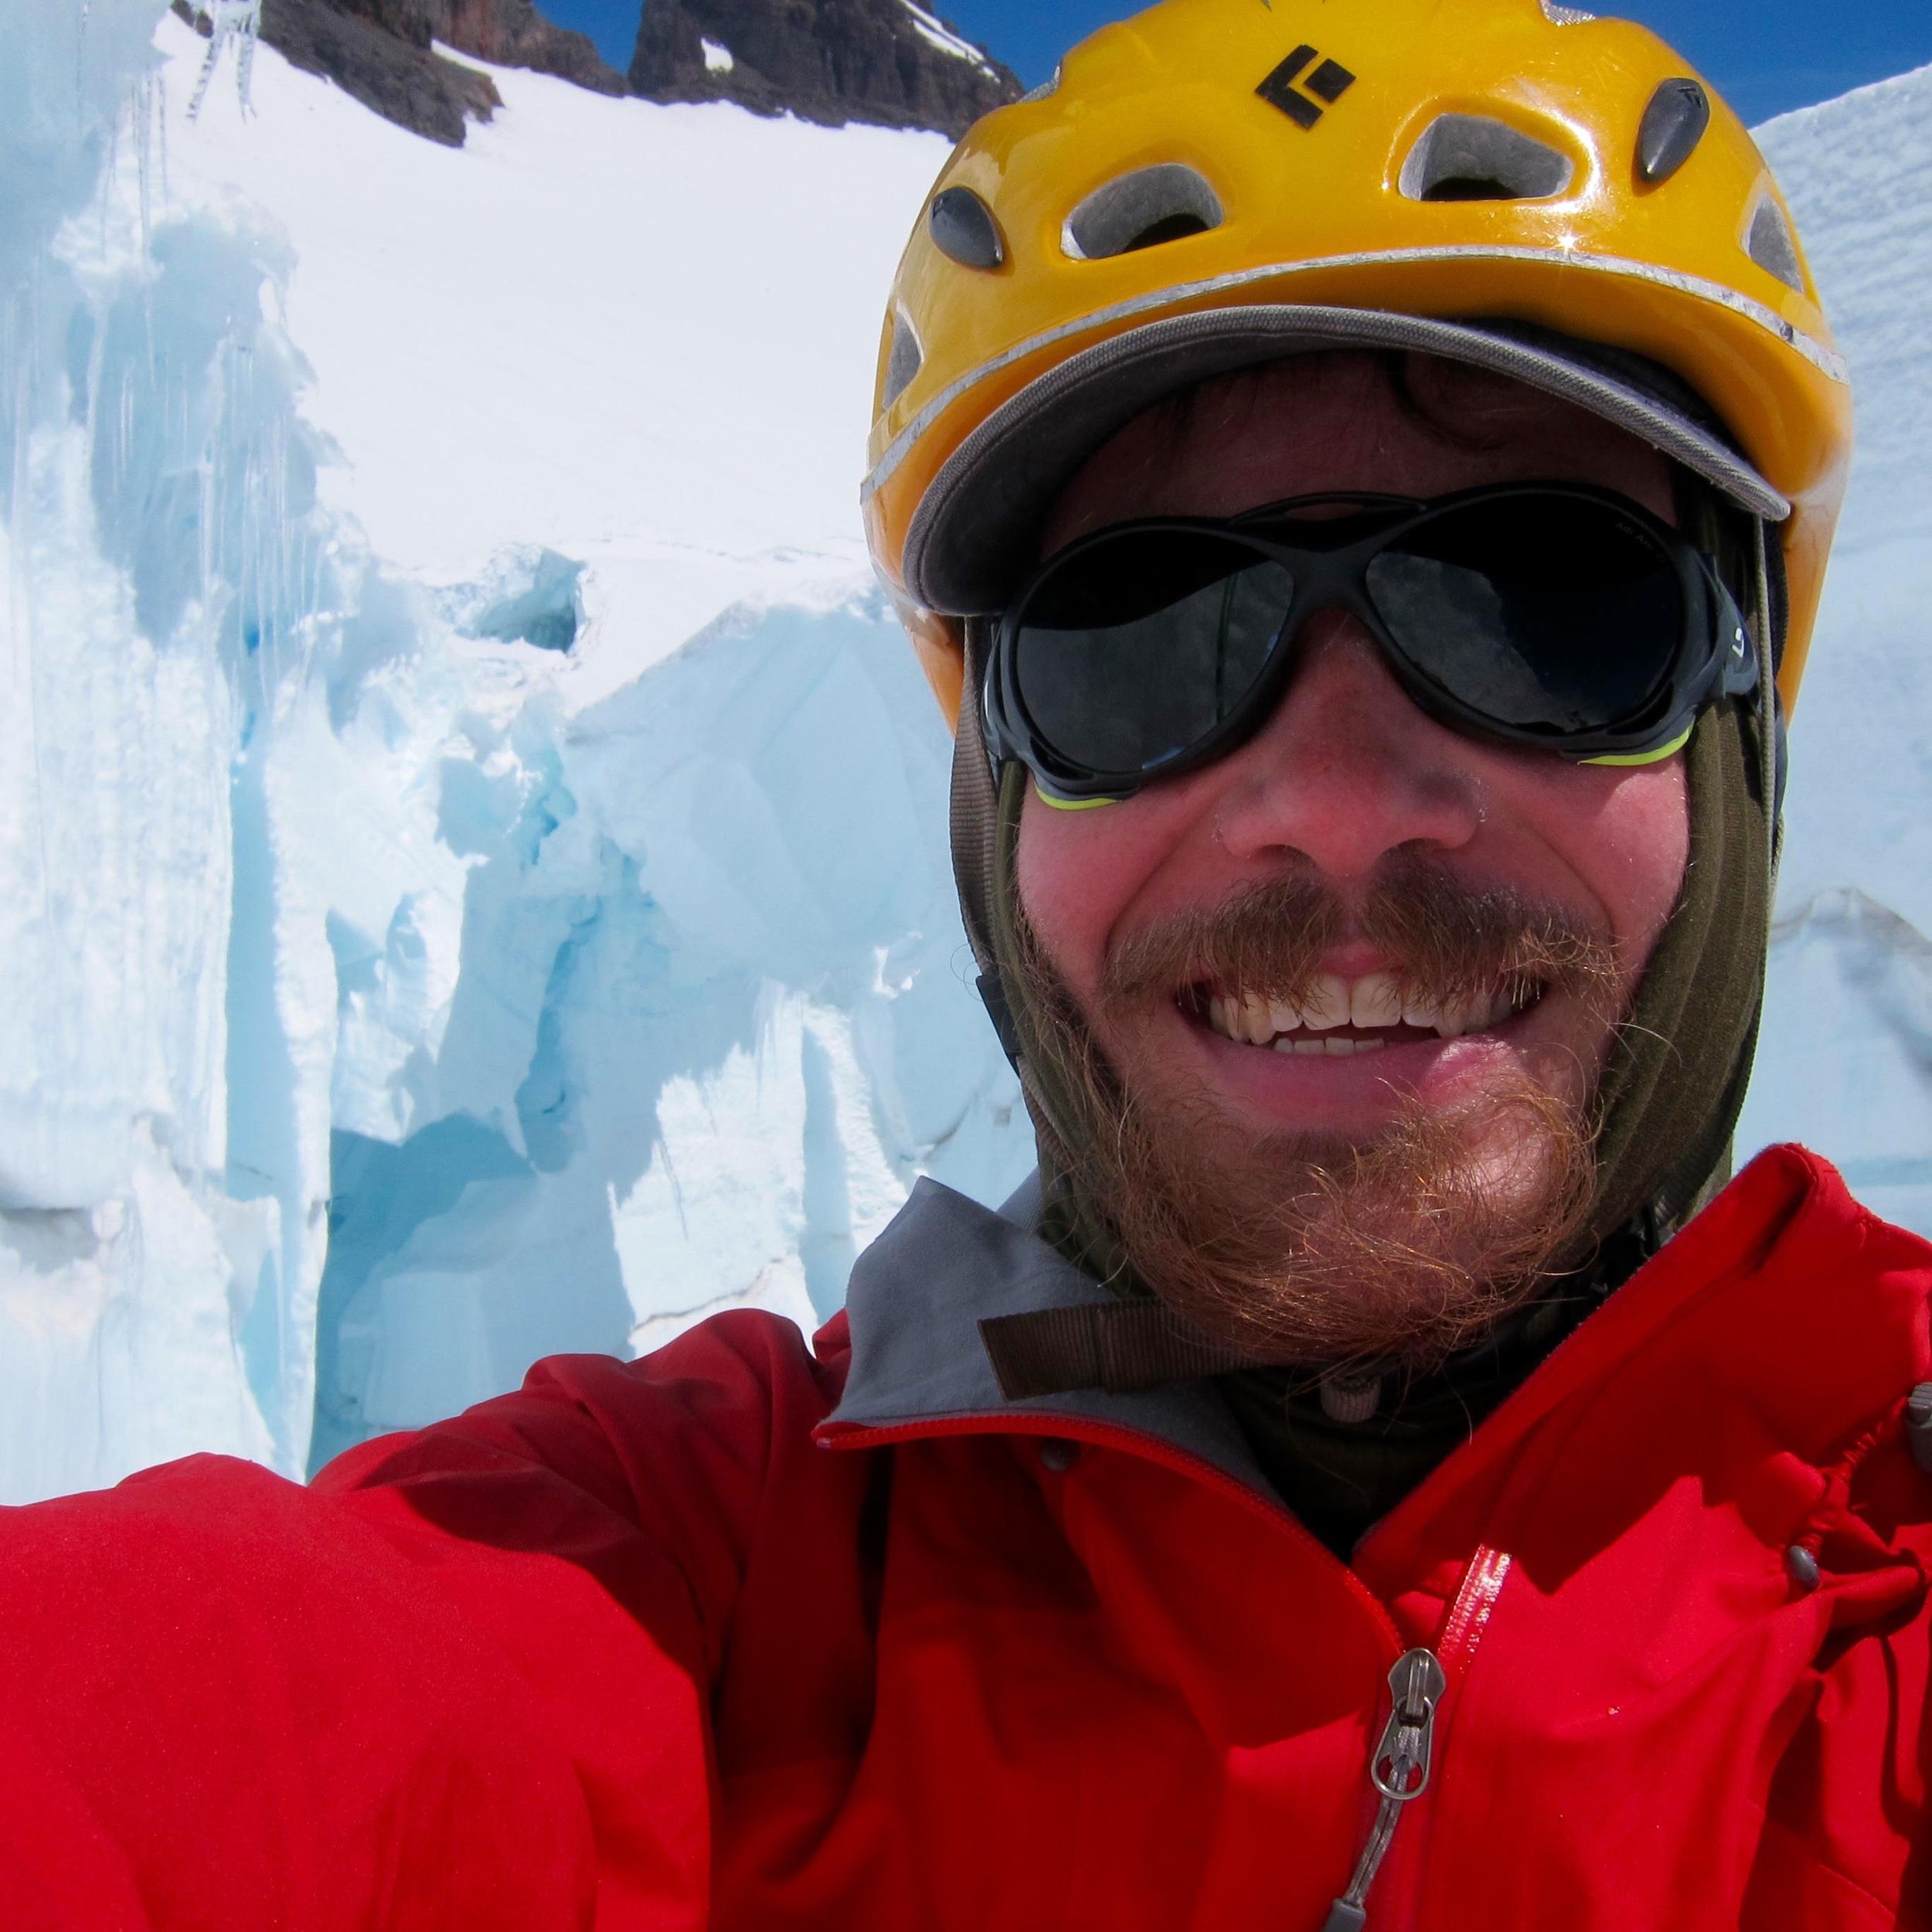 Inside the crevasse. Pretty cold down here!